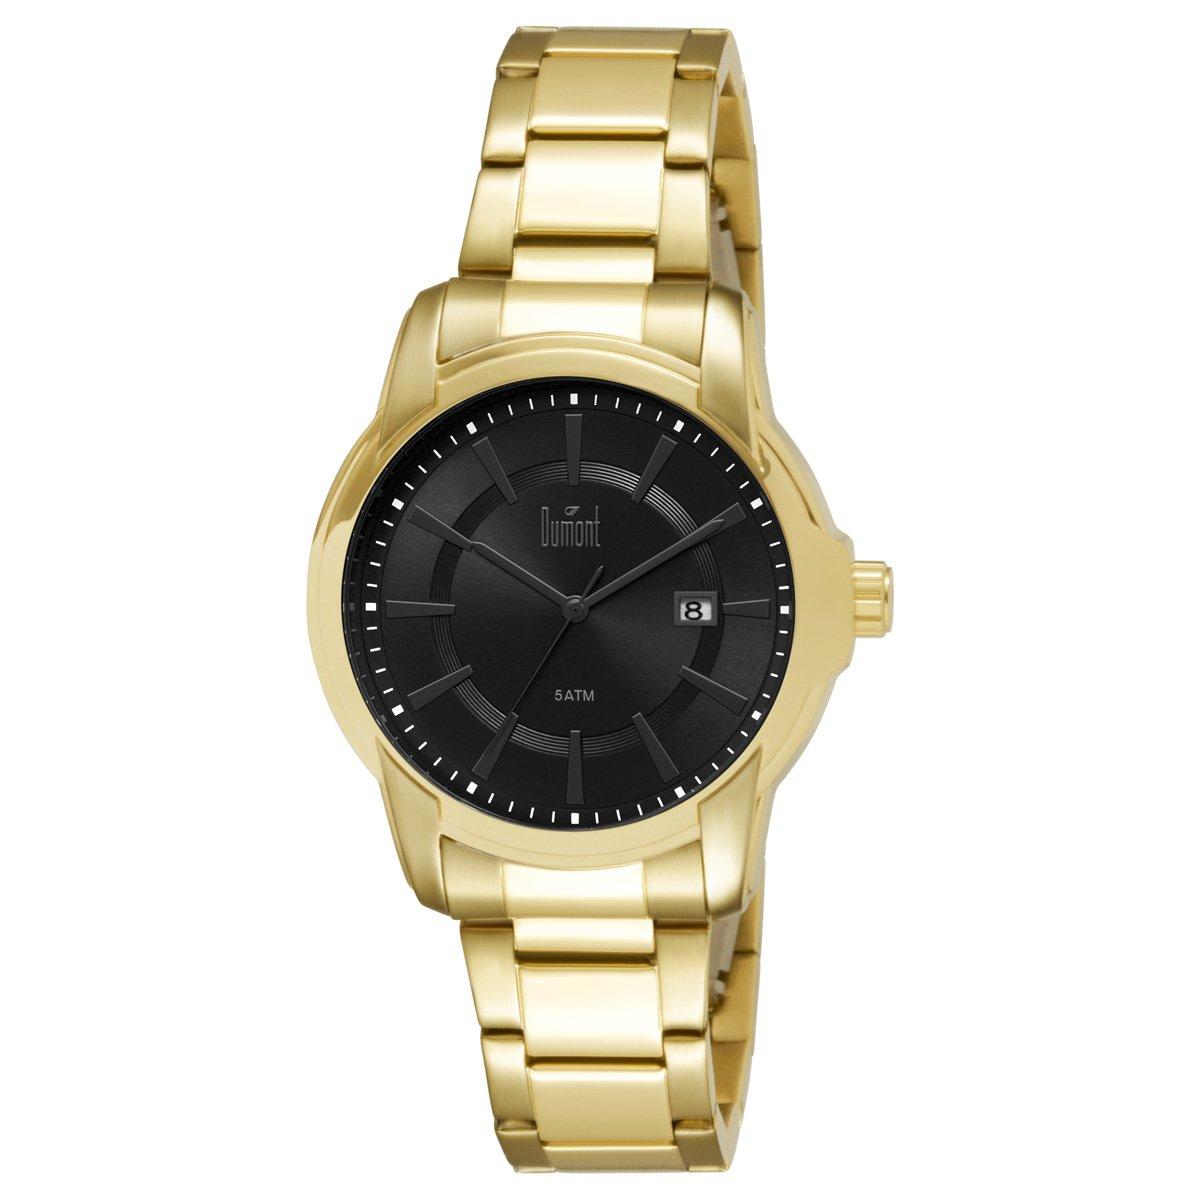 5824a1577e8ed Relógio Dumont Caixa e Pulseira De Metal Banhado - Compre Agora ...